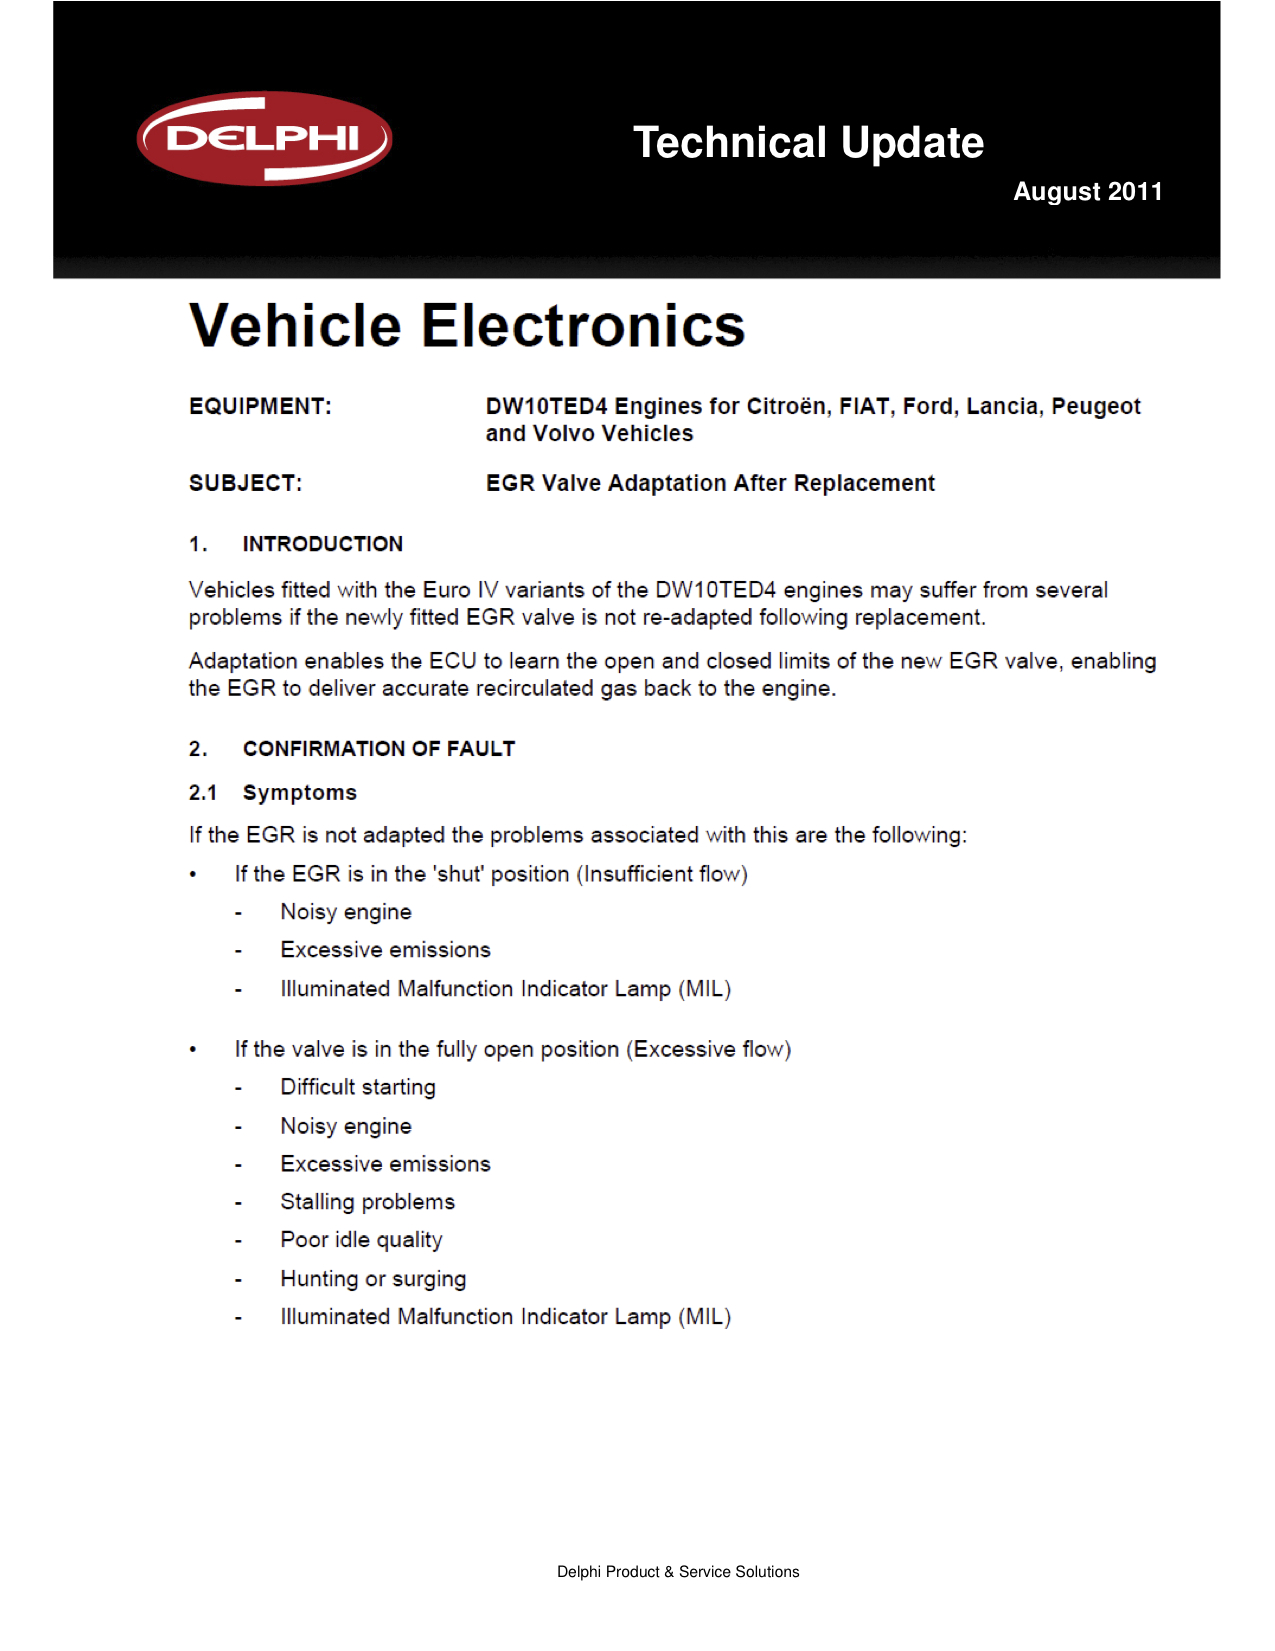 Ford Focus EGR Adaptation 1